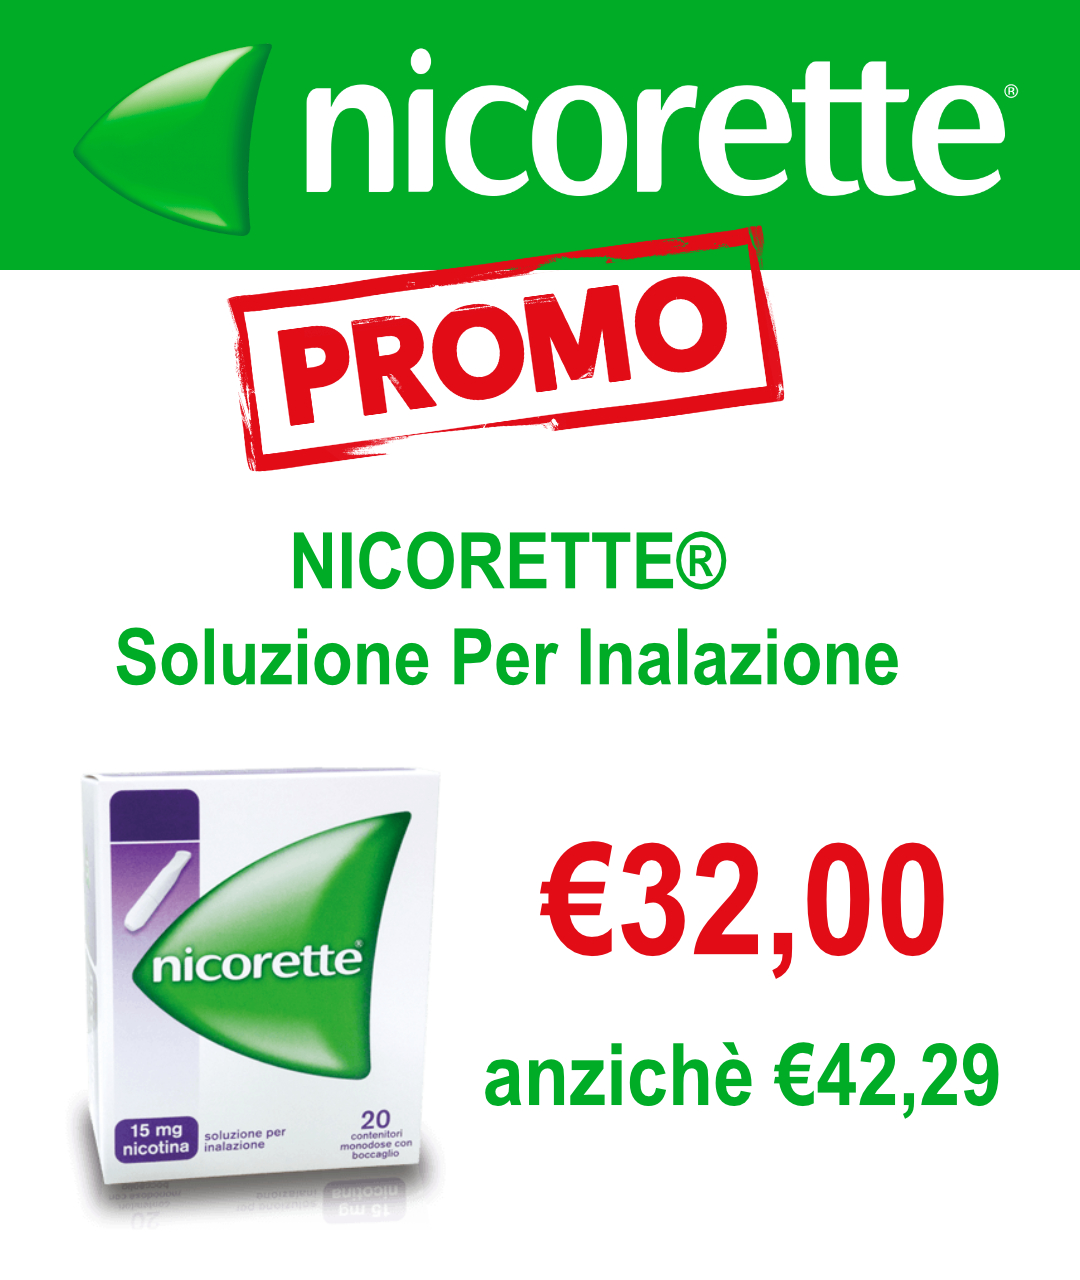 Nicorette-06-21